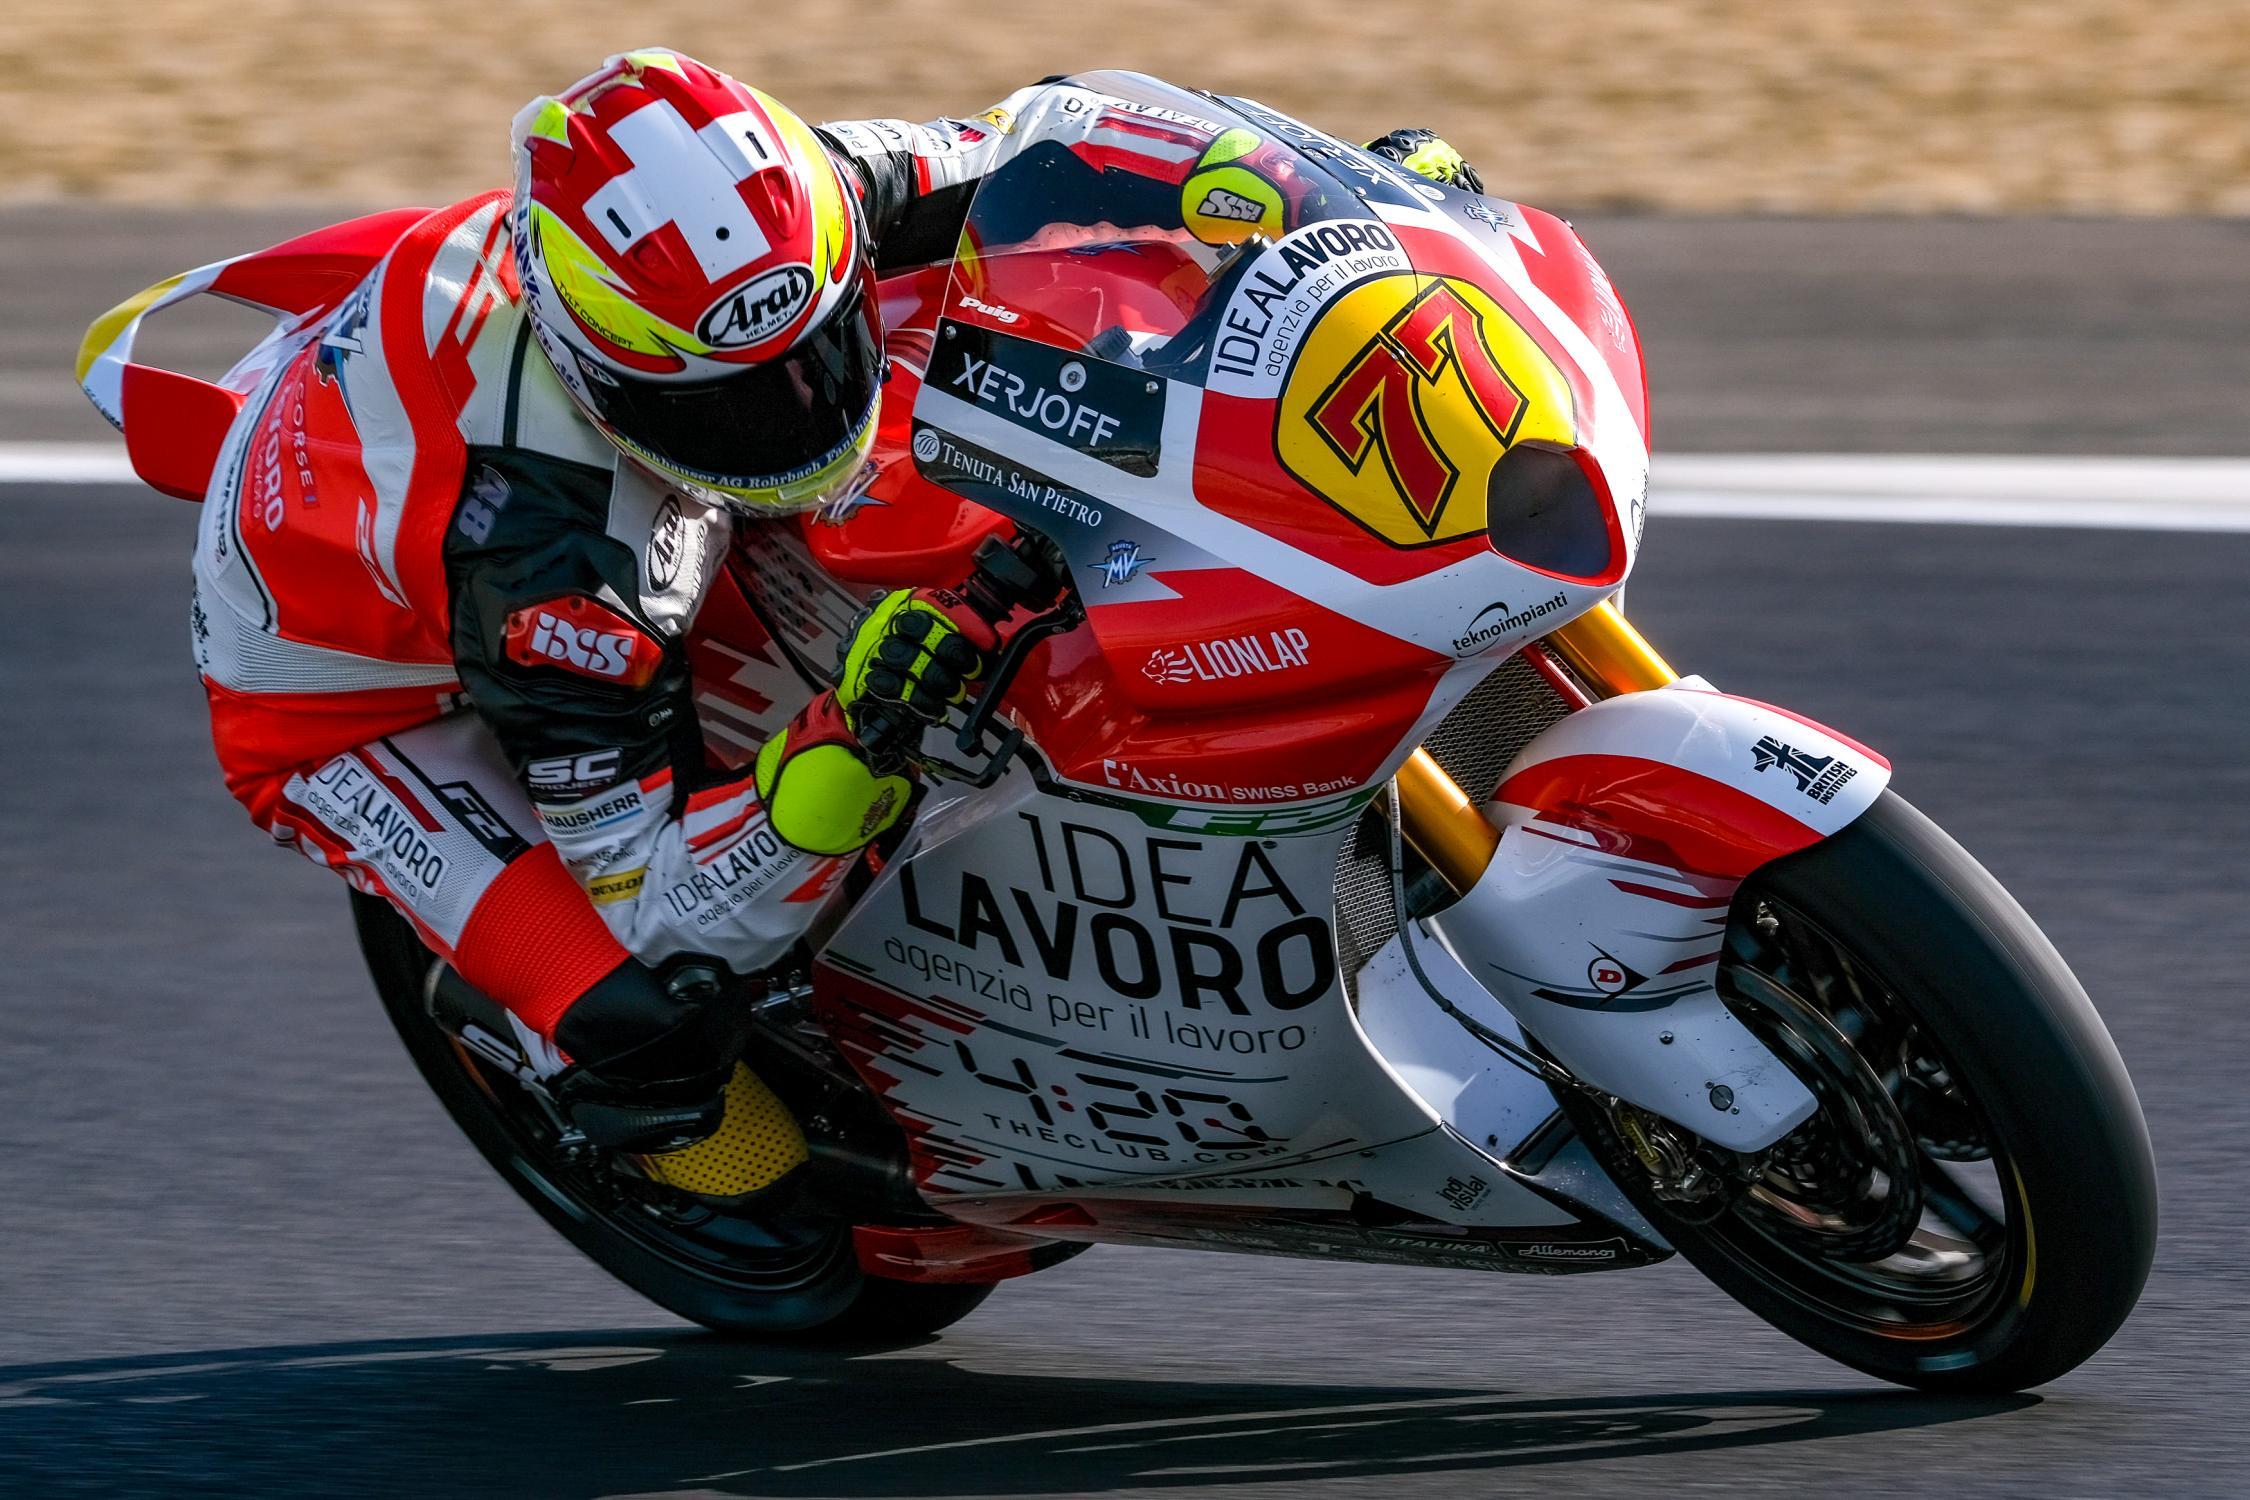 MOTO GP Grand Prix d'Espagne – Jerez  5 mai 2019  Dominique-aegerter-jerez-test-moto2-2019